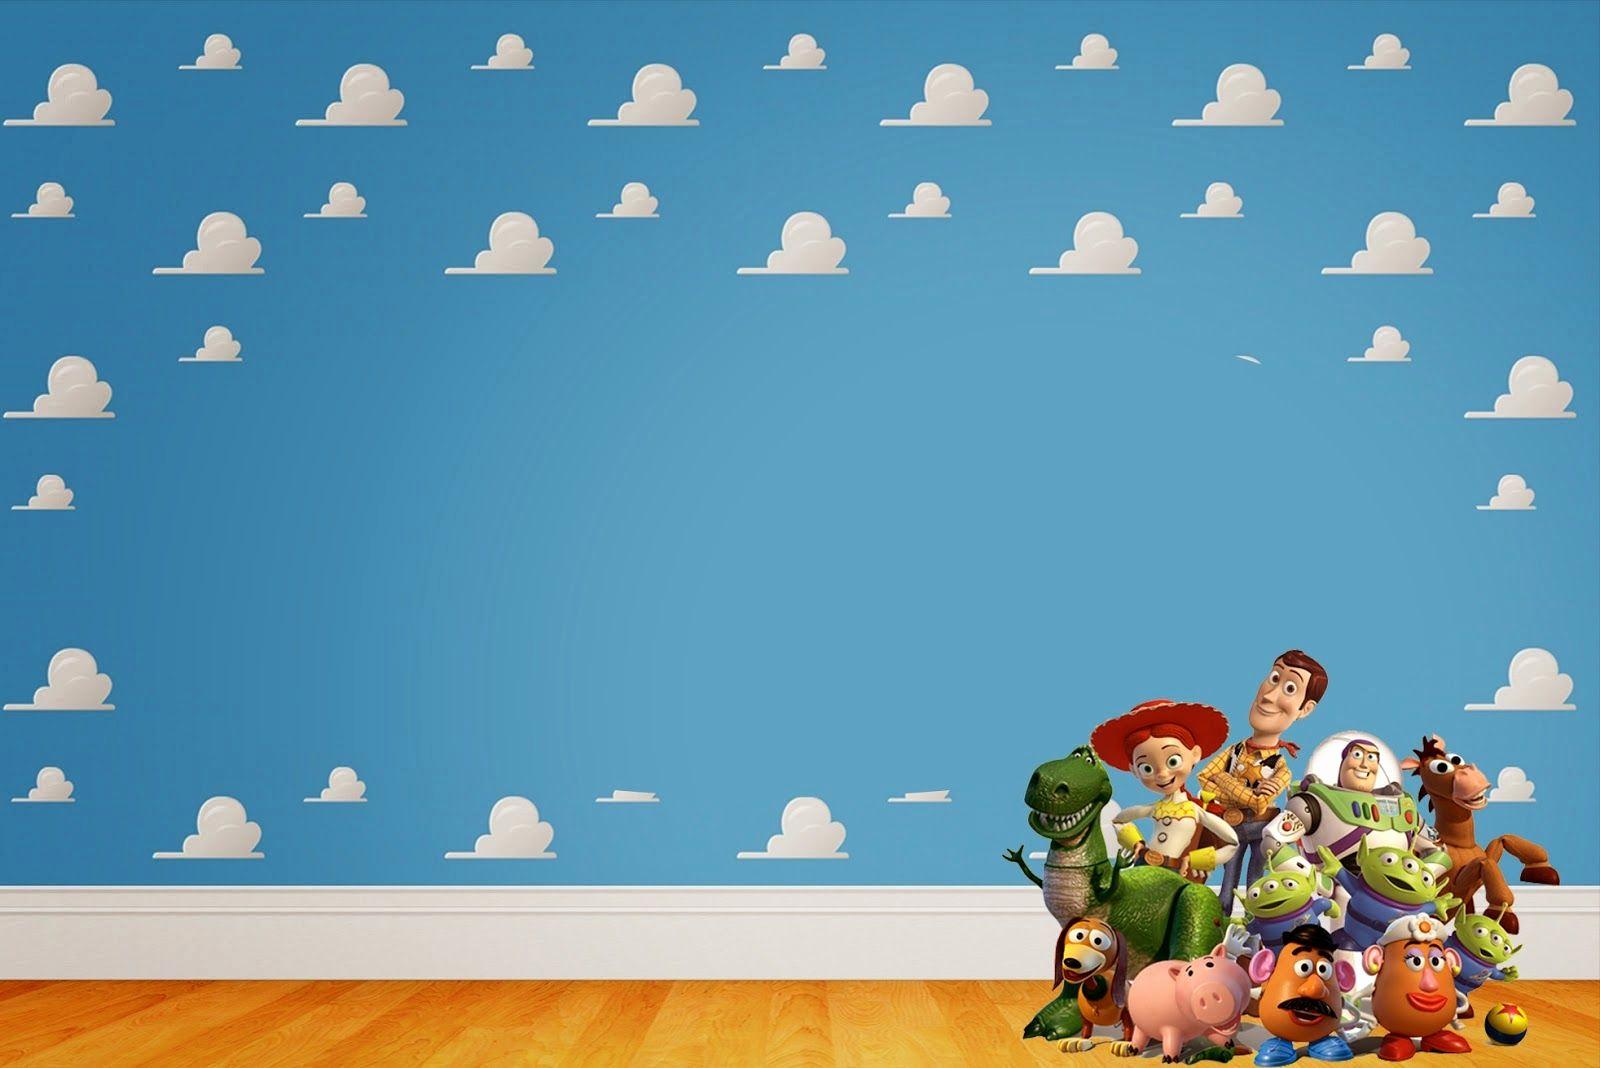 Toy Story Invitation Templates Free Fresh toy Story 3 Free Printable Invitations